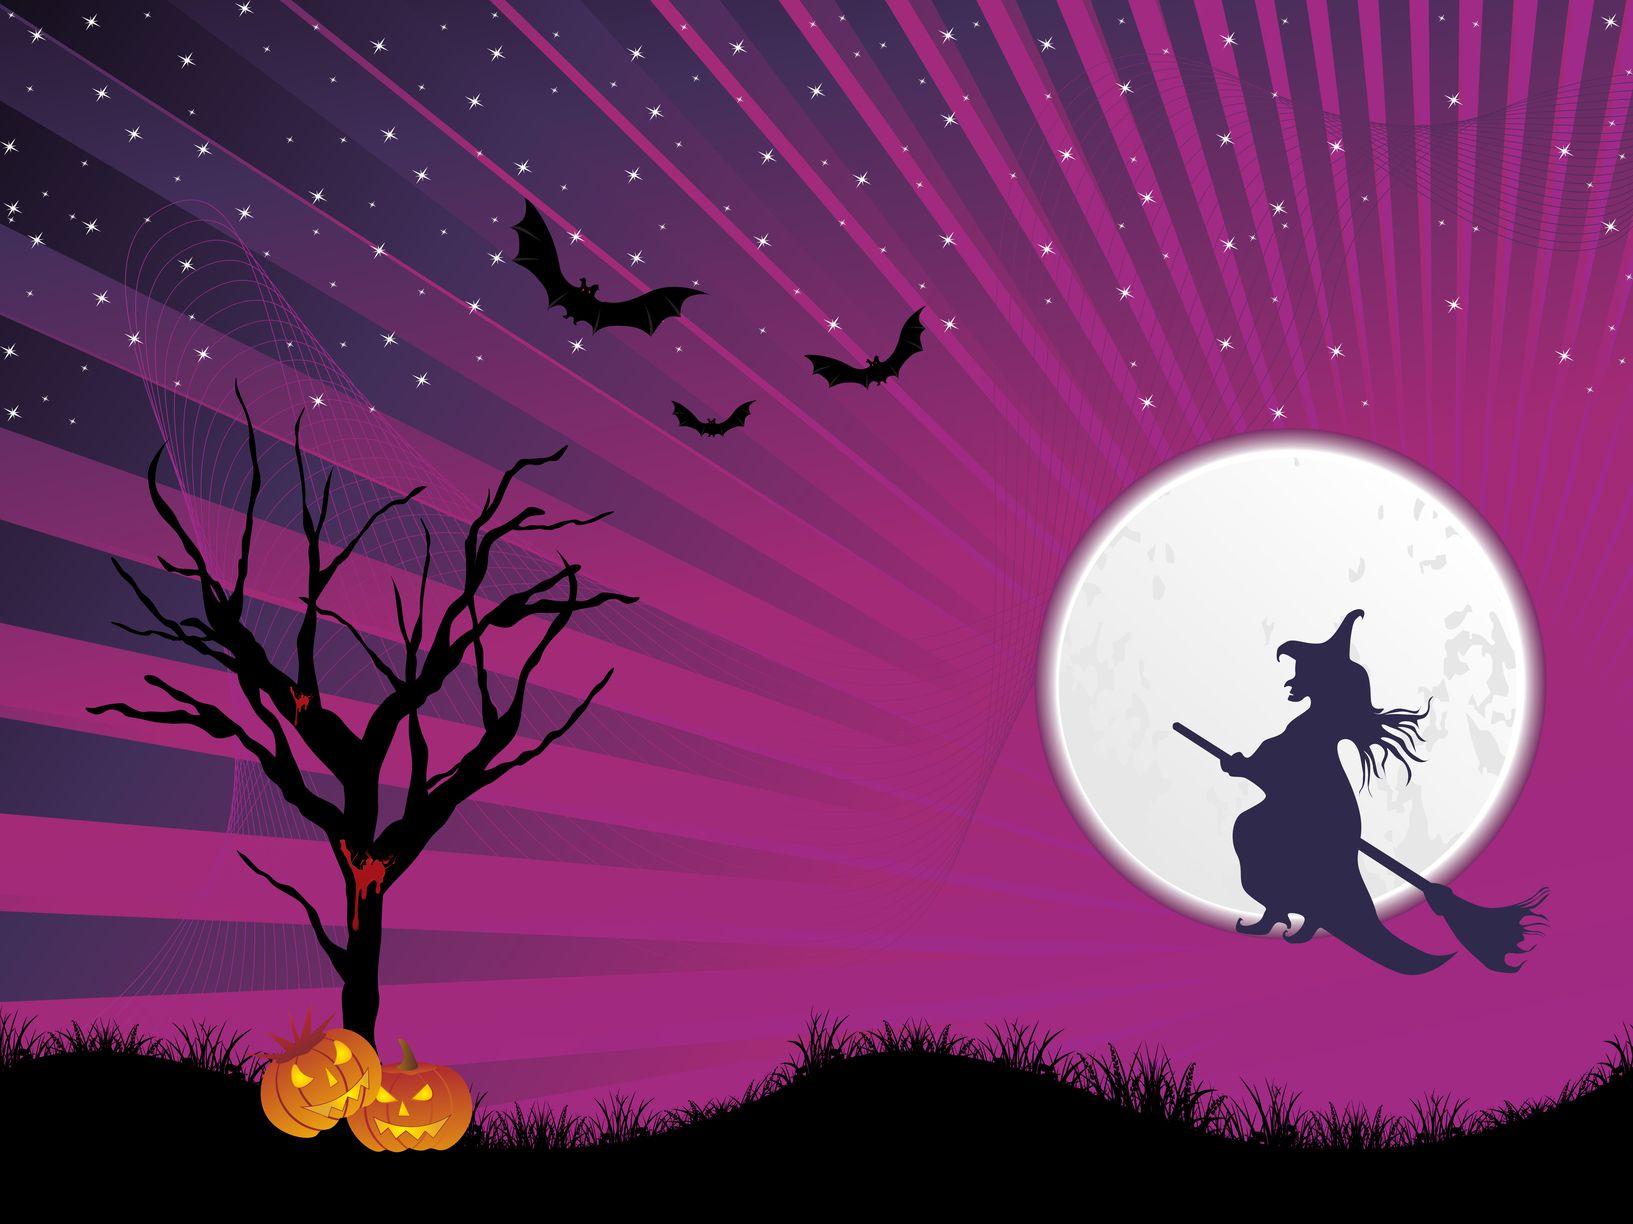 Popular Wallpaper Halloween Pink - e51f95daed23575d77f7dd6ffd3b6101  Best Photo Reference_605811.jpg